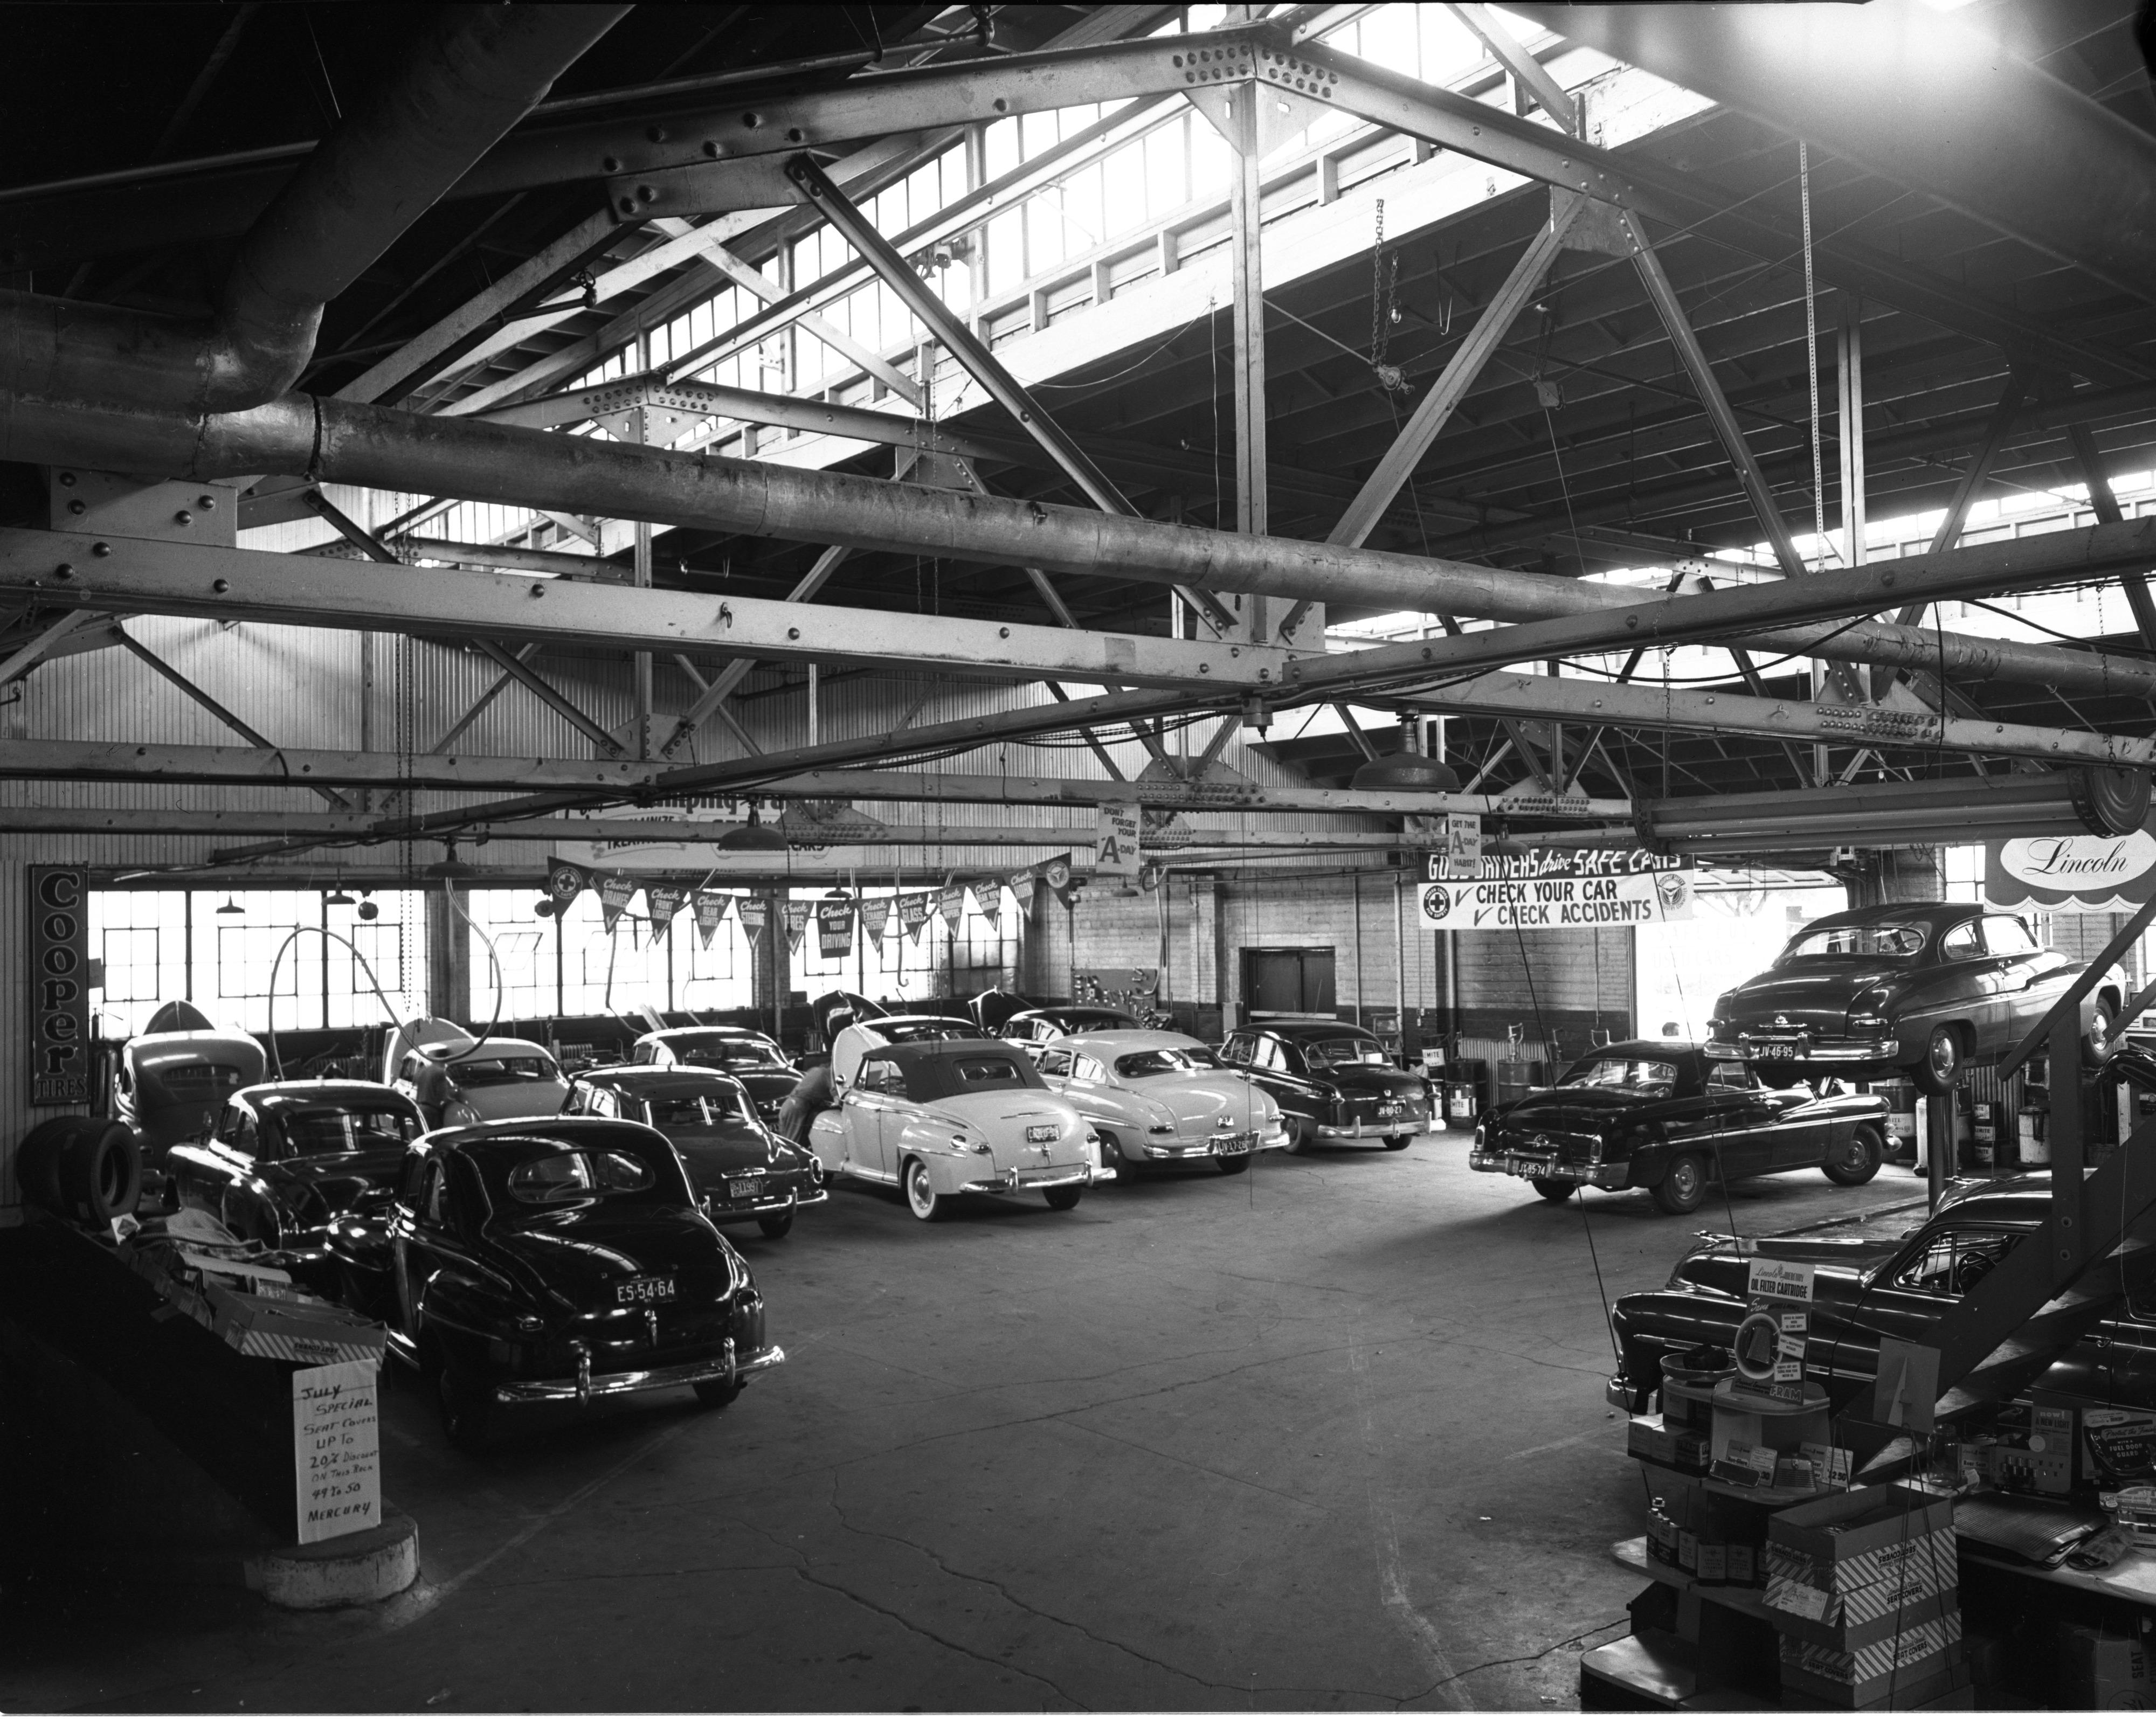 dealership lincoln images autos mercury pcilich proposal design pinterest on best front end continental og